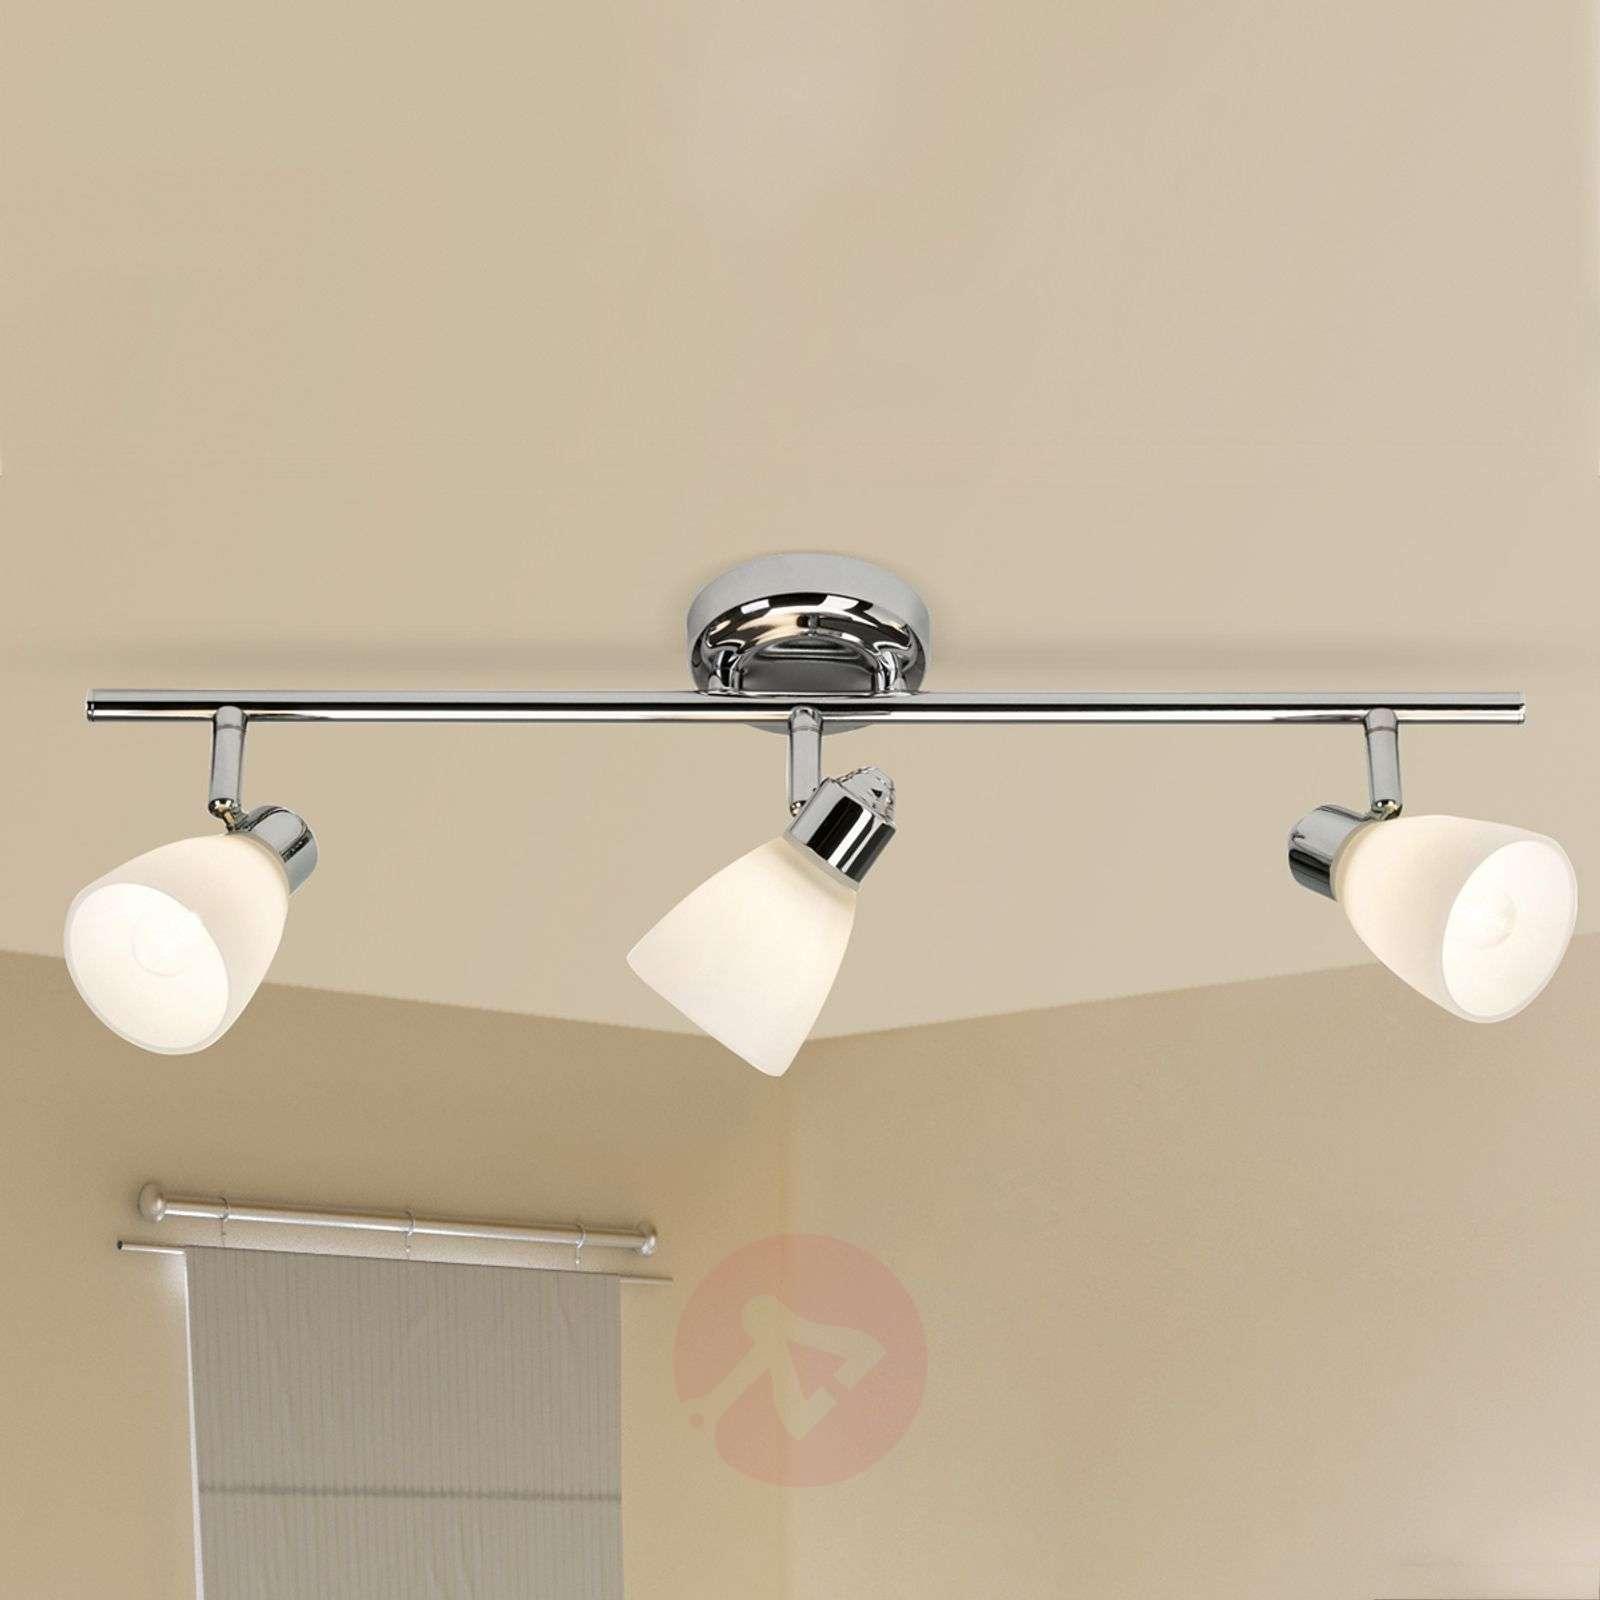 Three-bulb ceiling lamp Kensington with IP44-1509161-01